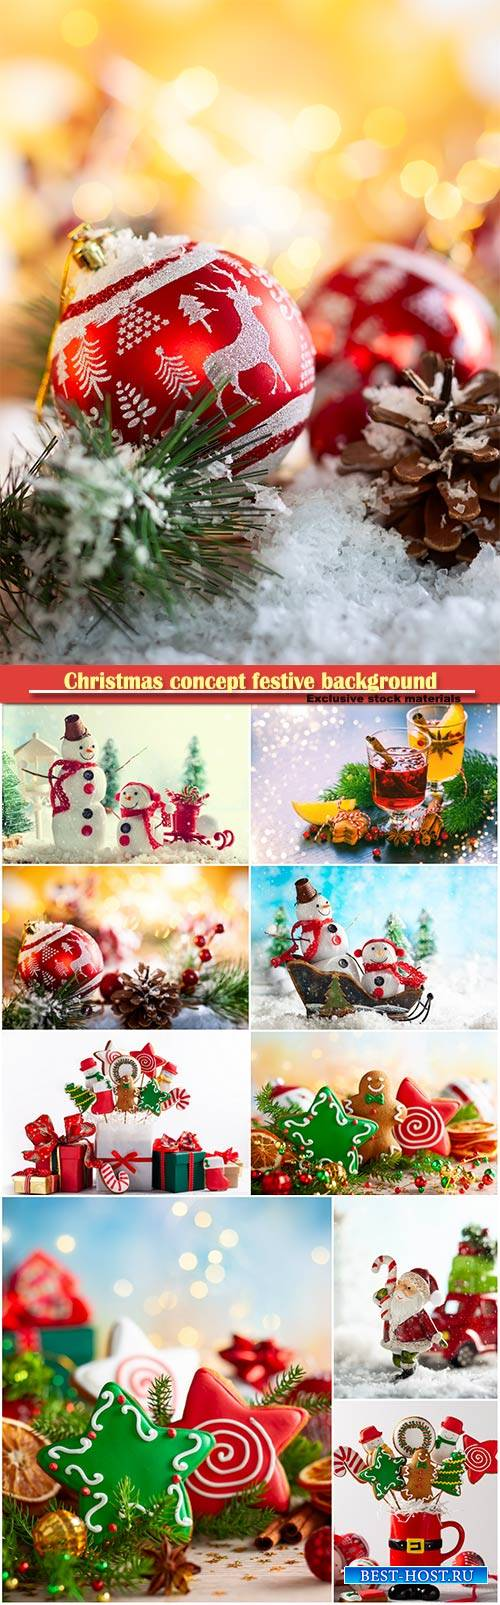 Christmas concept festive background